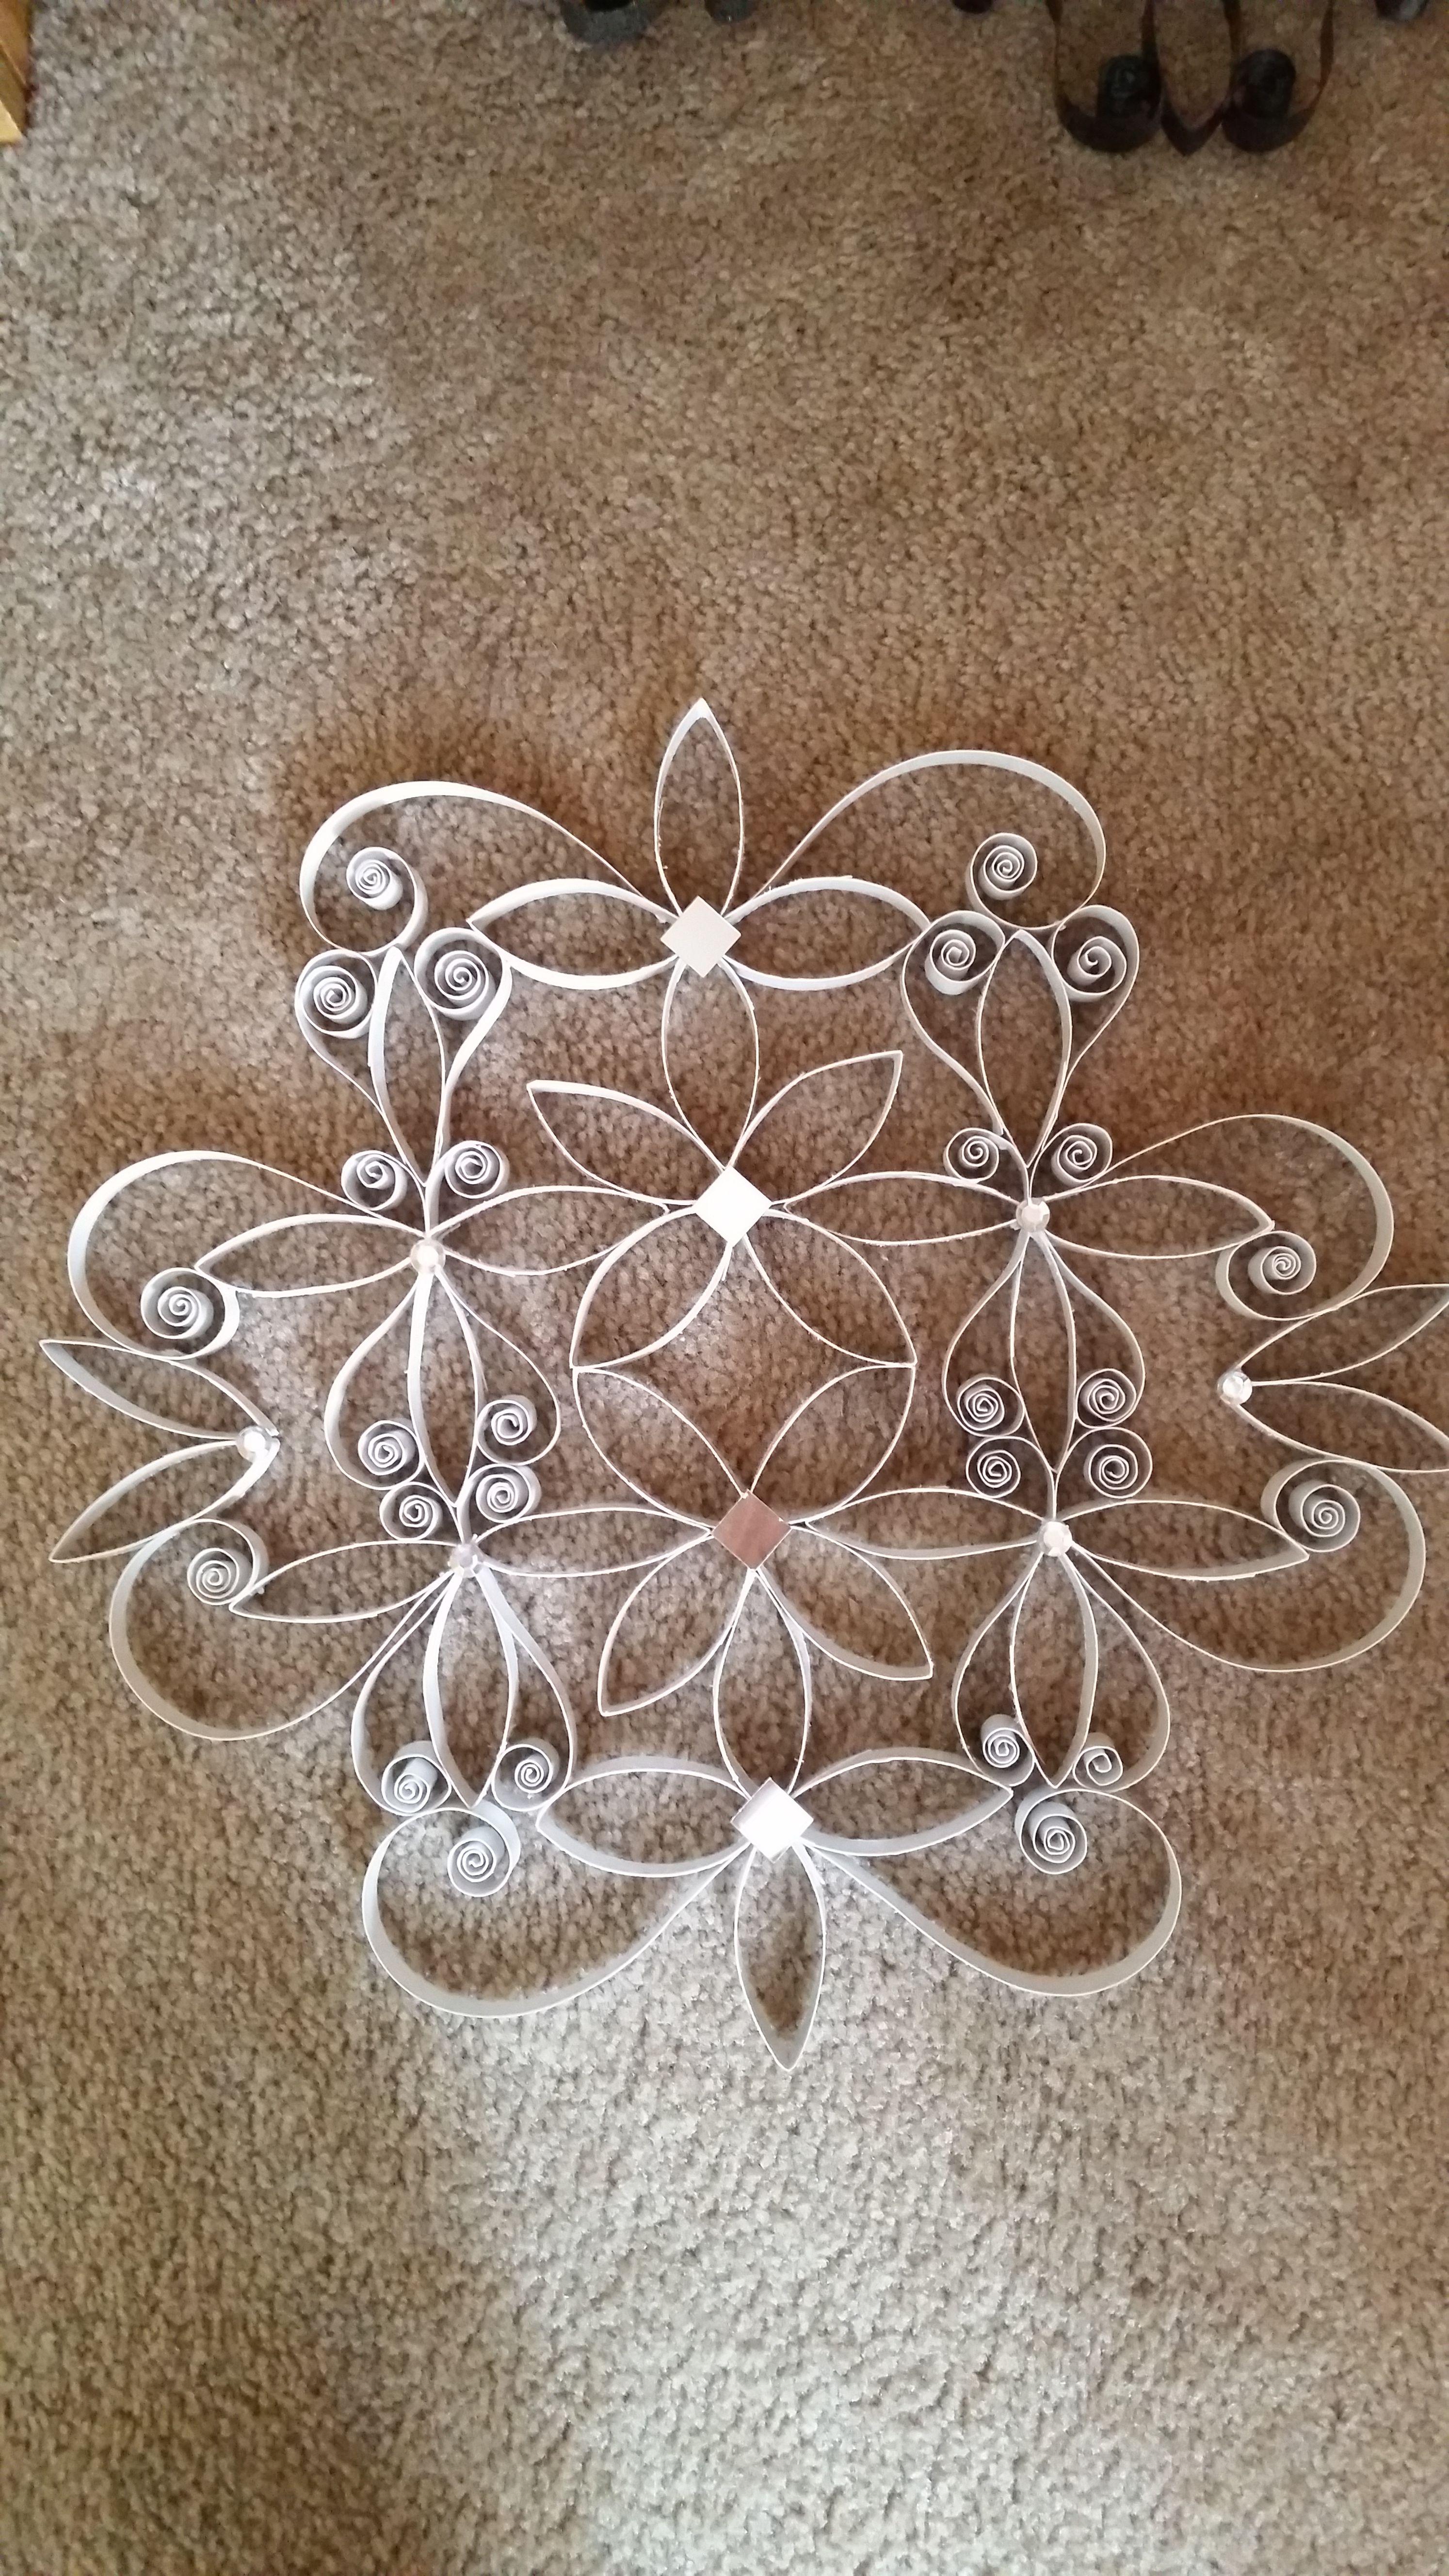 Paper Towel Roll Wall Art